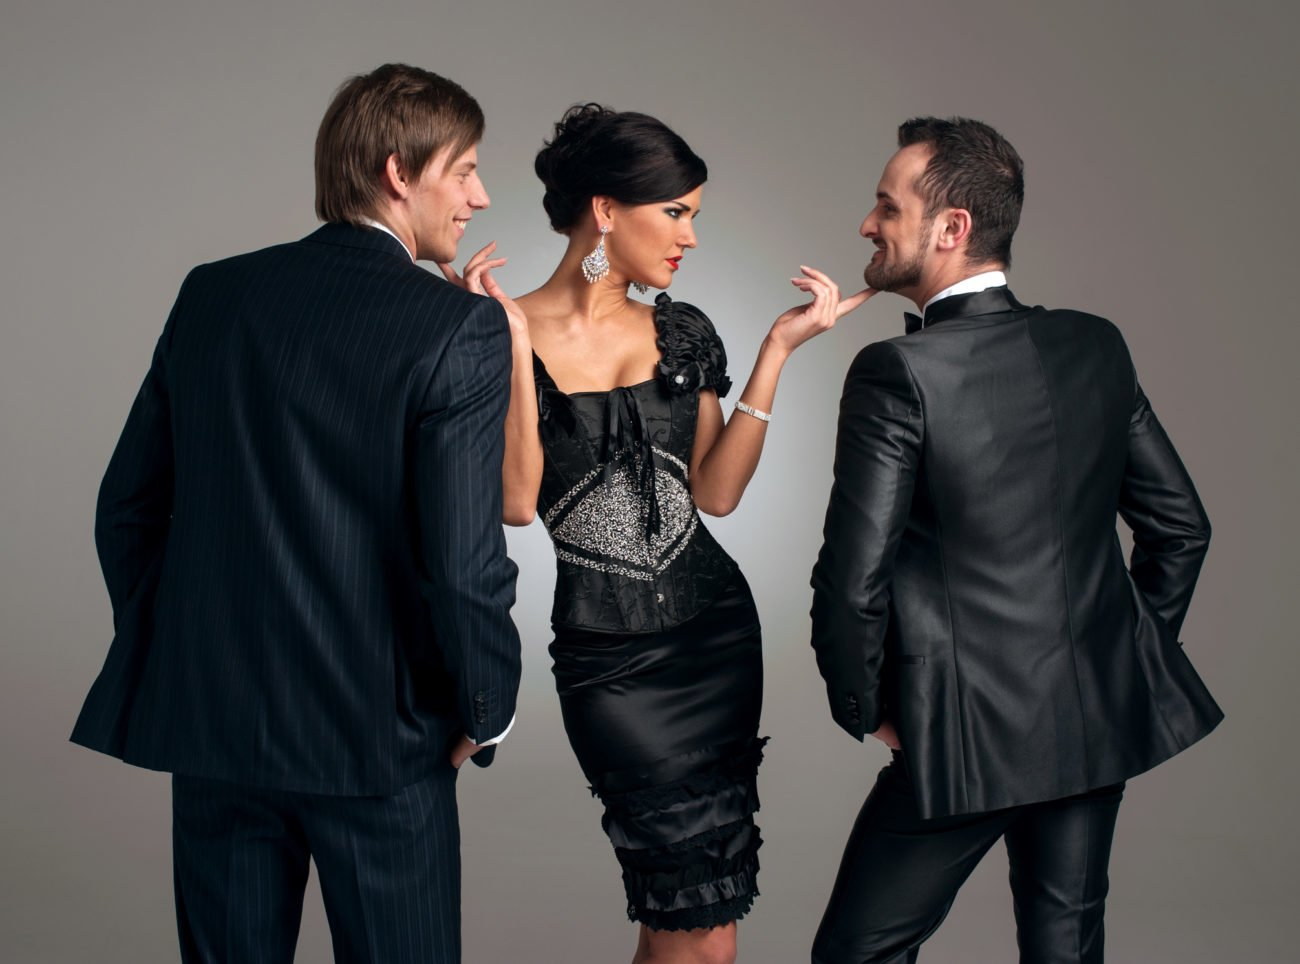 Frau mit zwei Männern